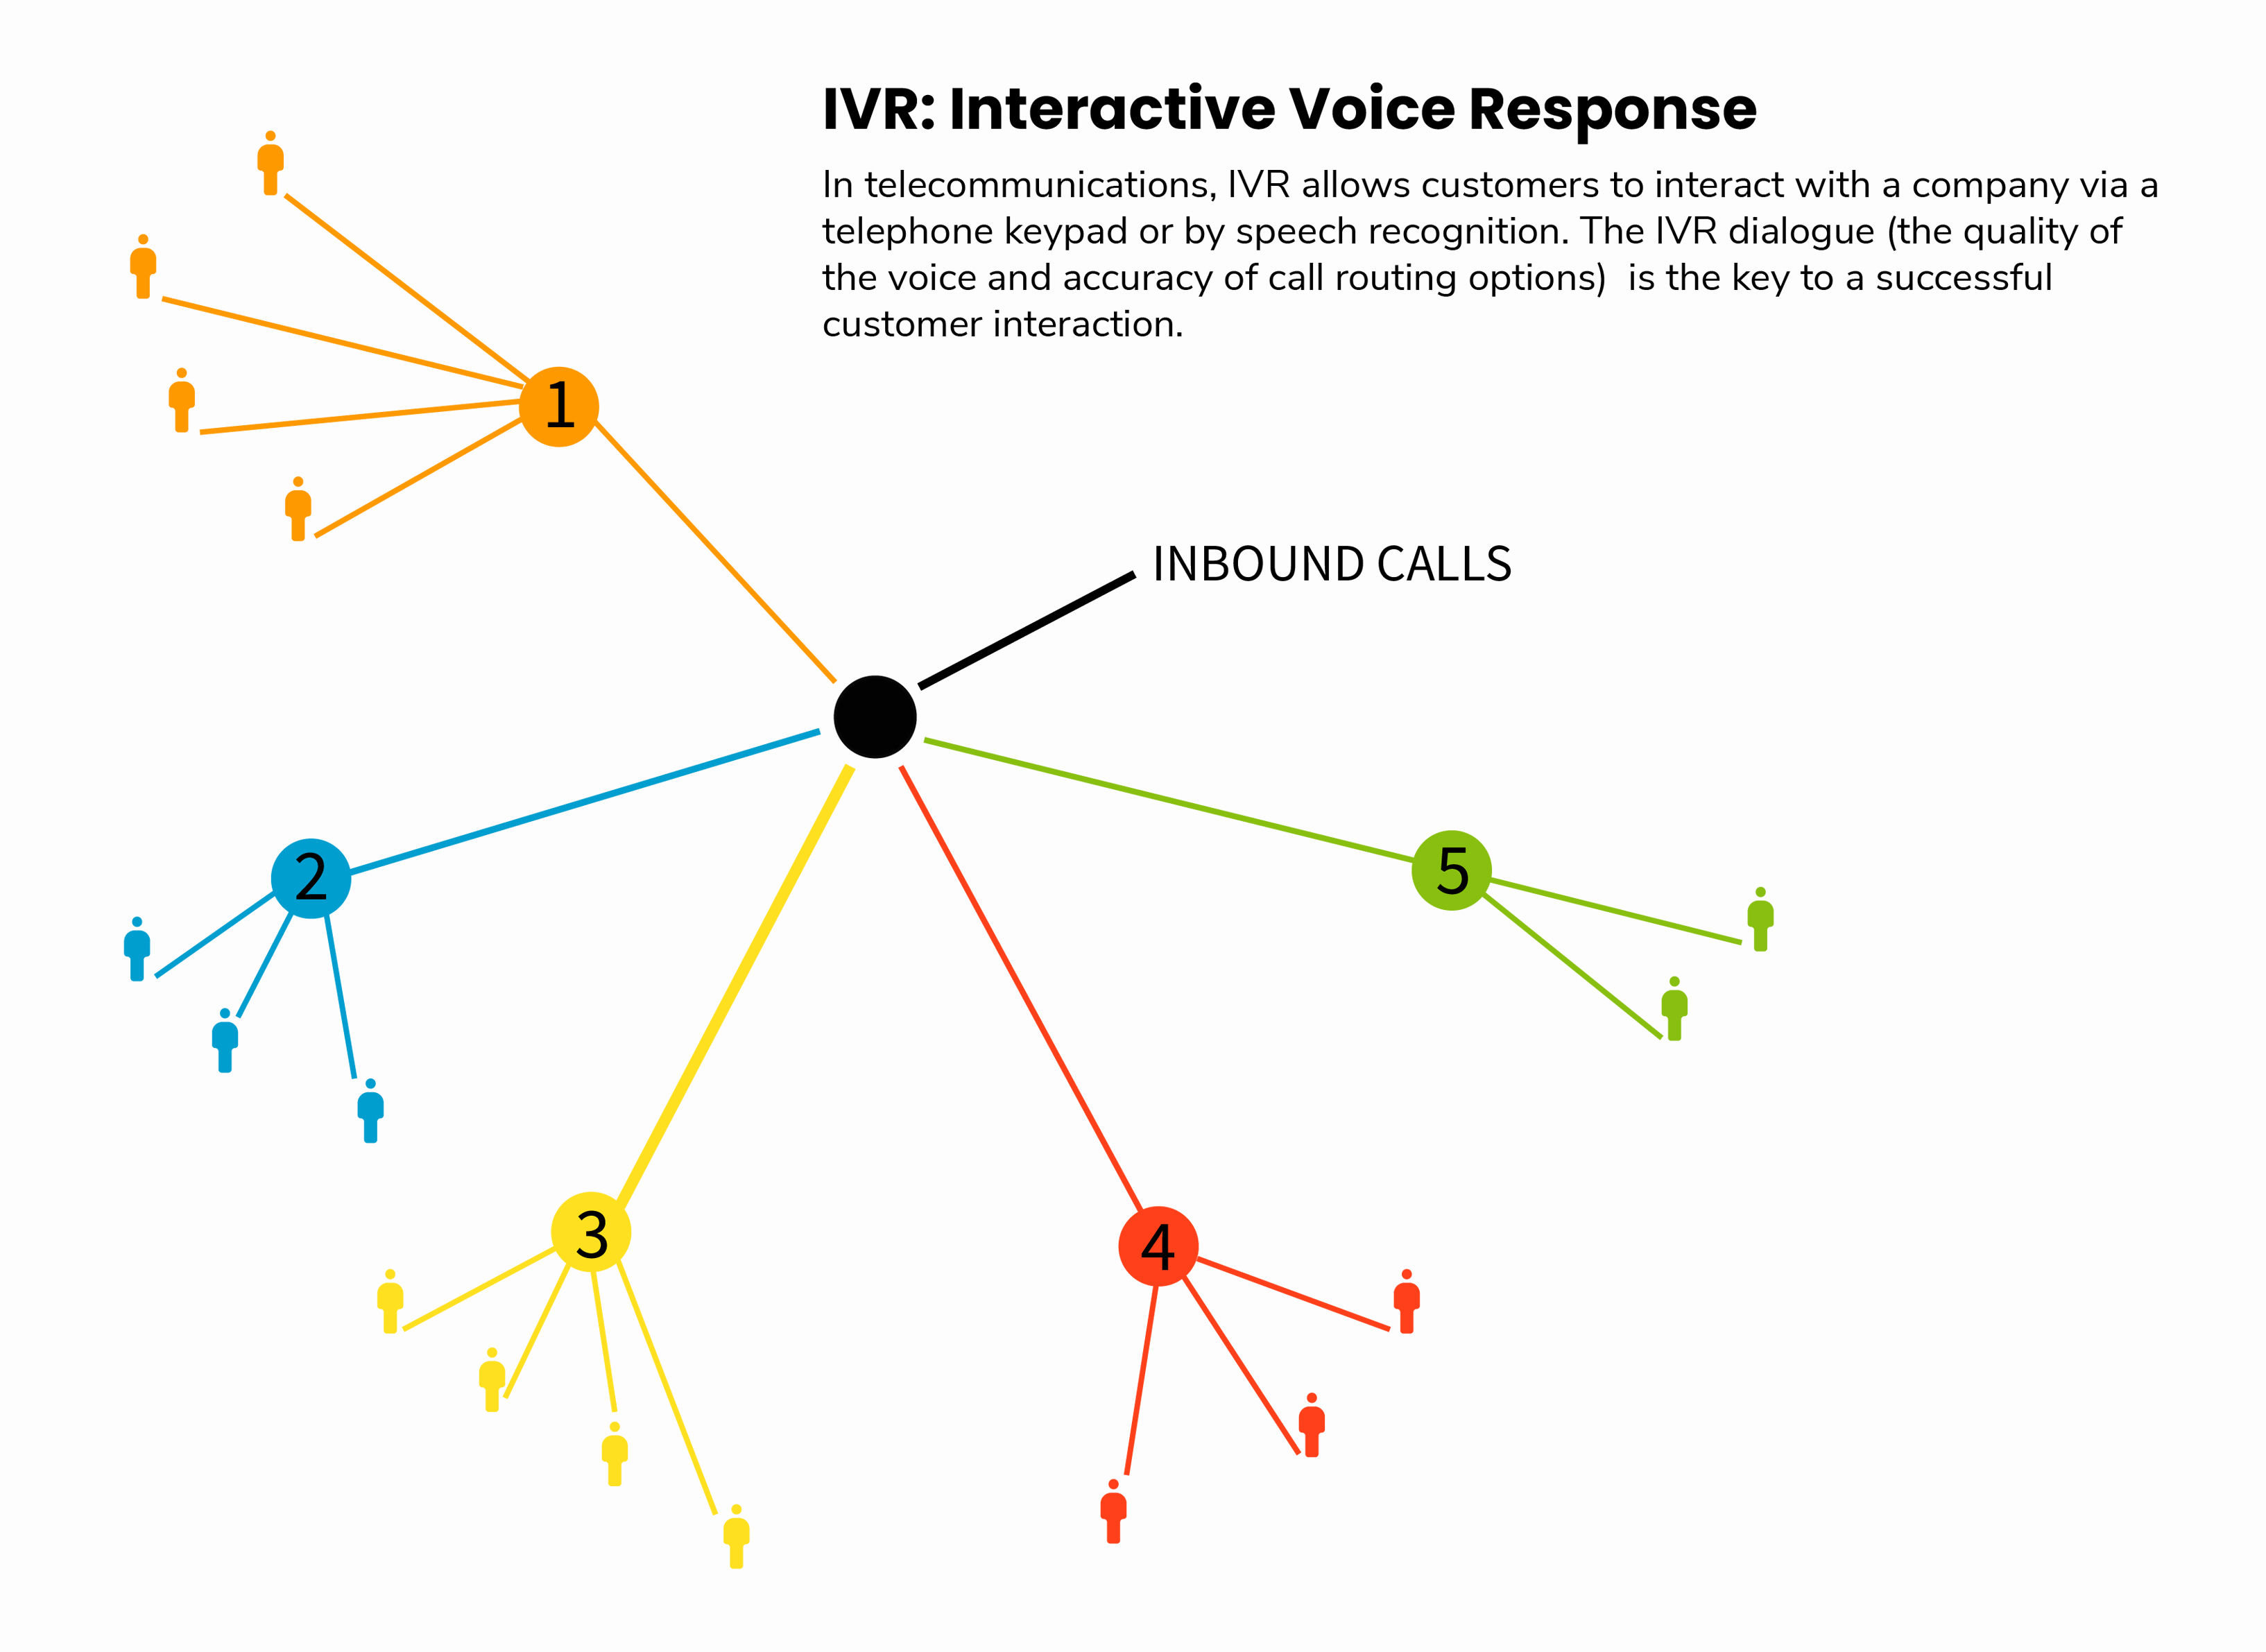 illustration demonstrates IVR